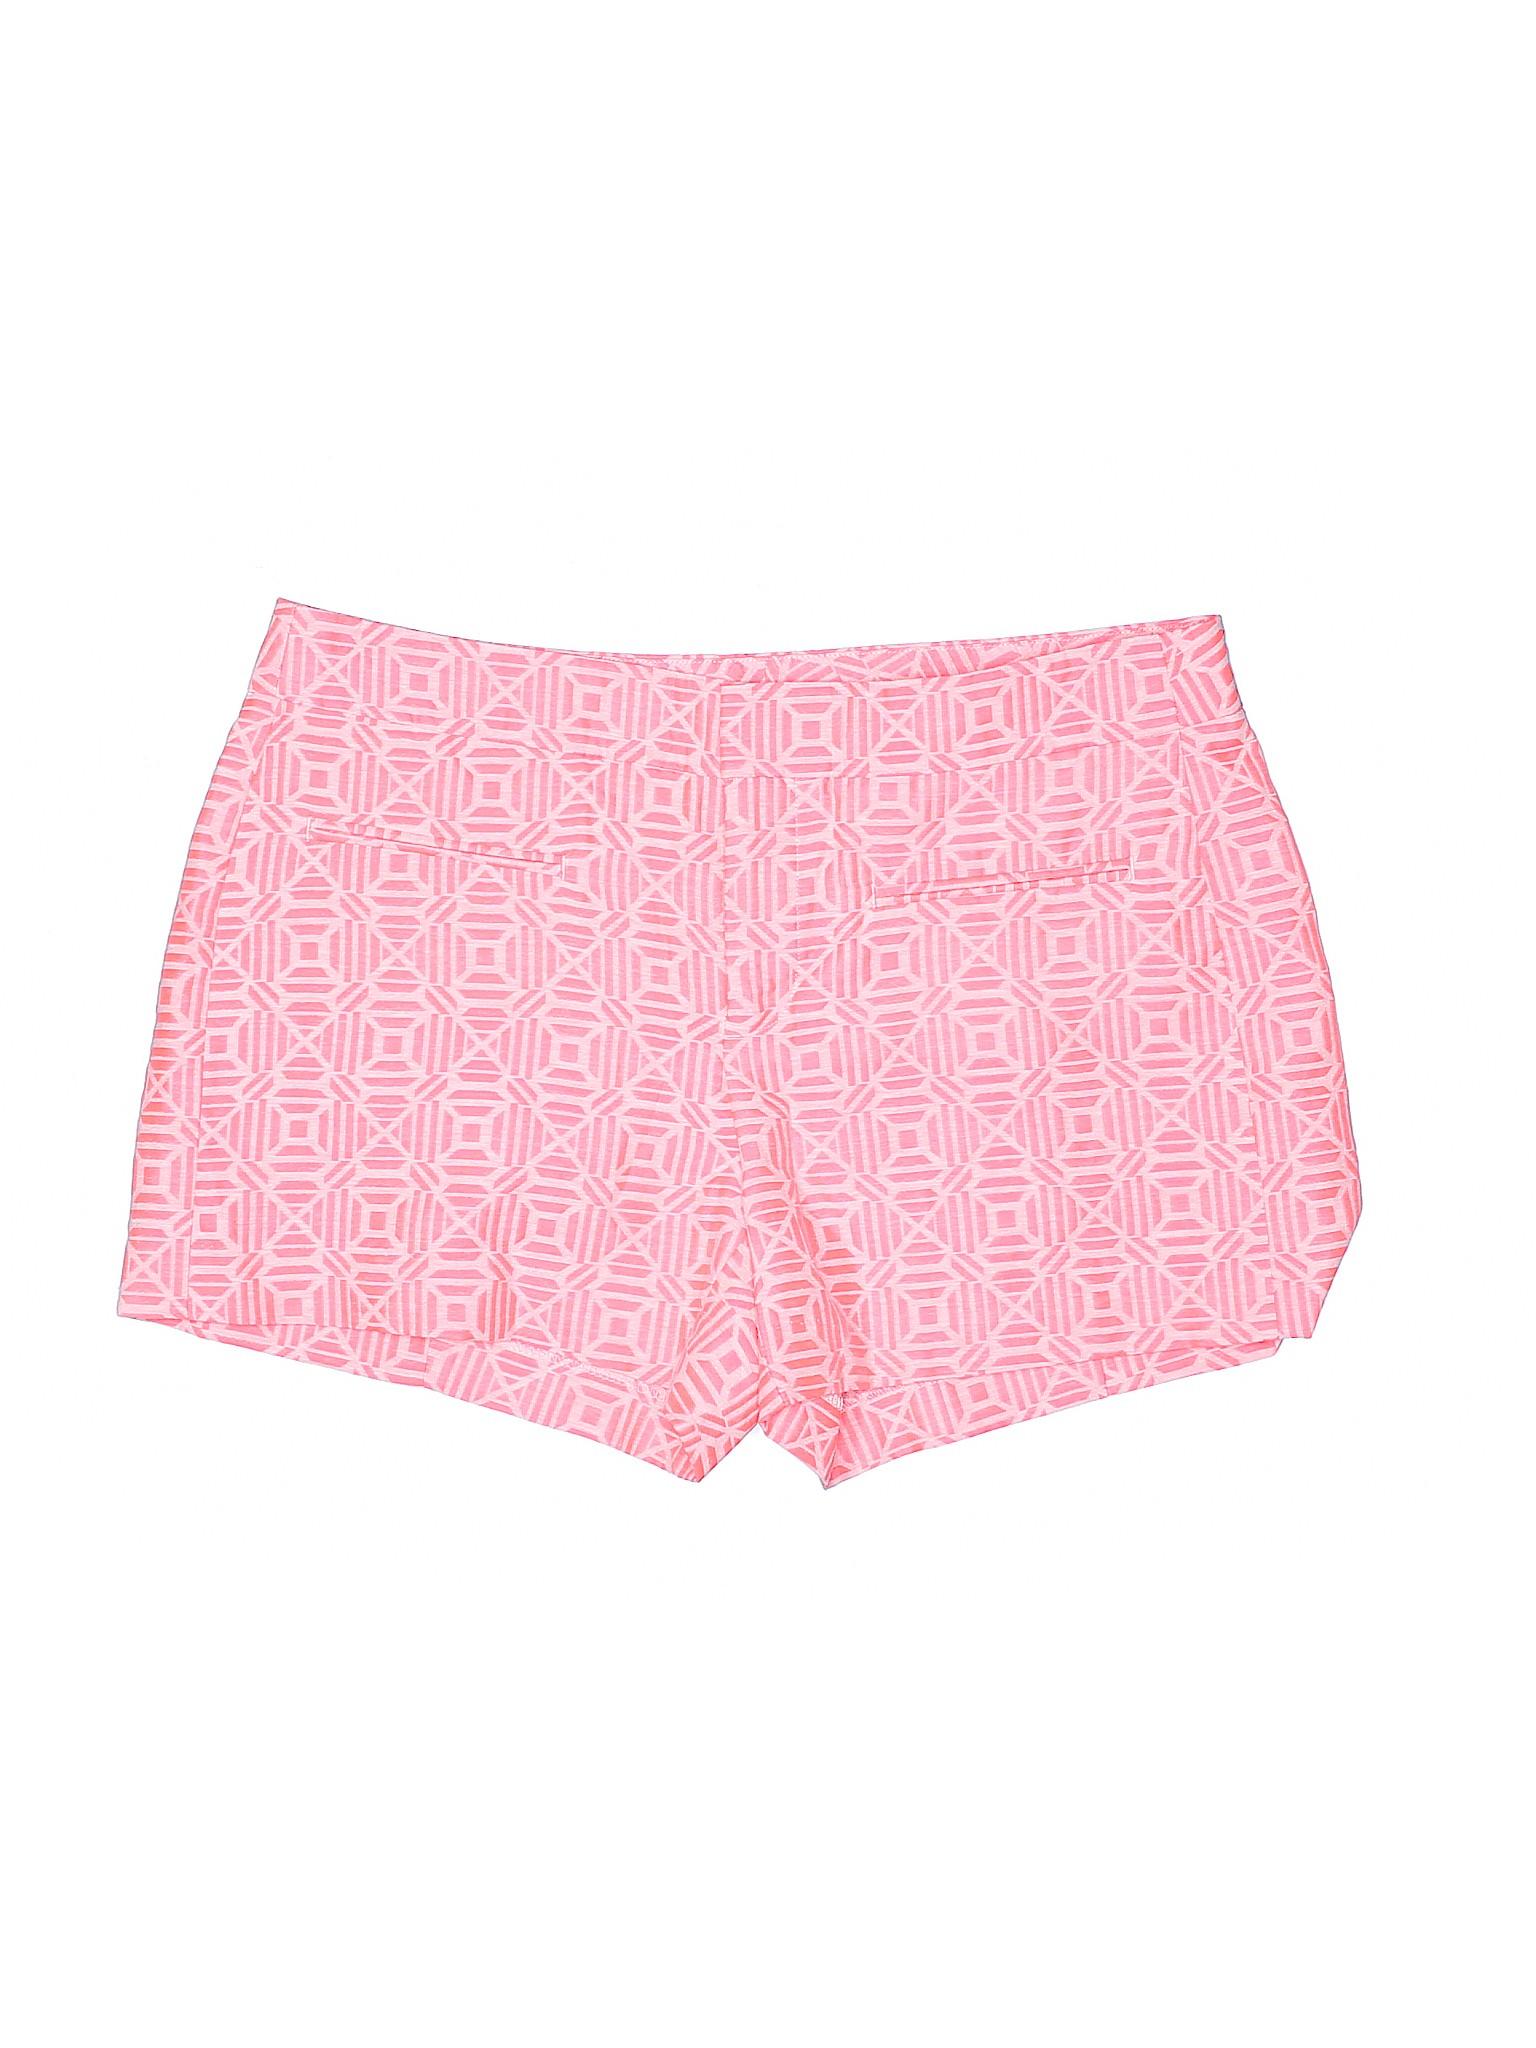 Boutique Gap Gap Shorts Boutique Boutique Shorts Gap Shorts Boutique w7CSgq